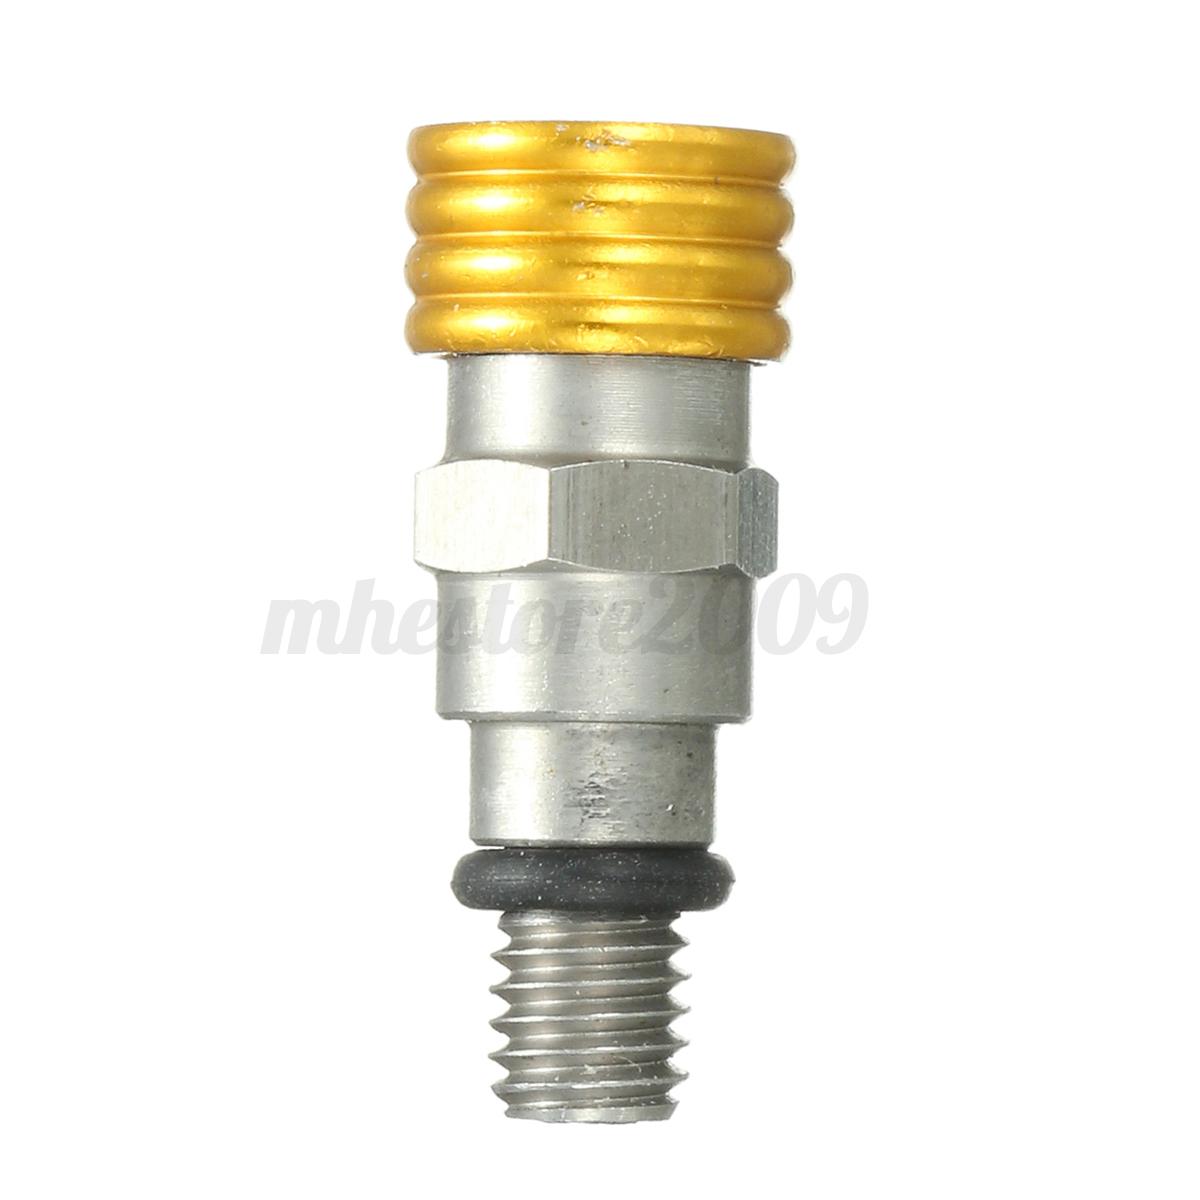 2x motocross bike fork air pressure bleeder valve for kayaba showa forks m5x0 8 ebay Showa SFF Forks showa forks manual